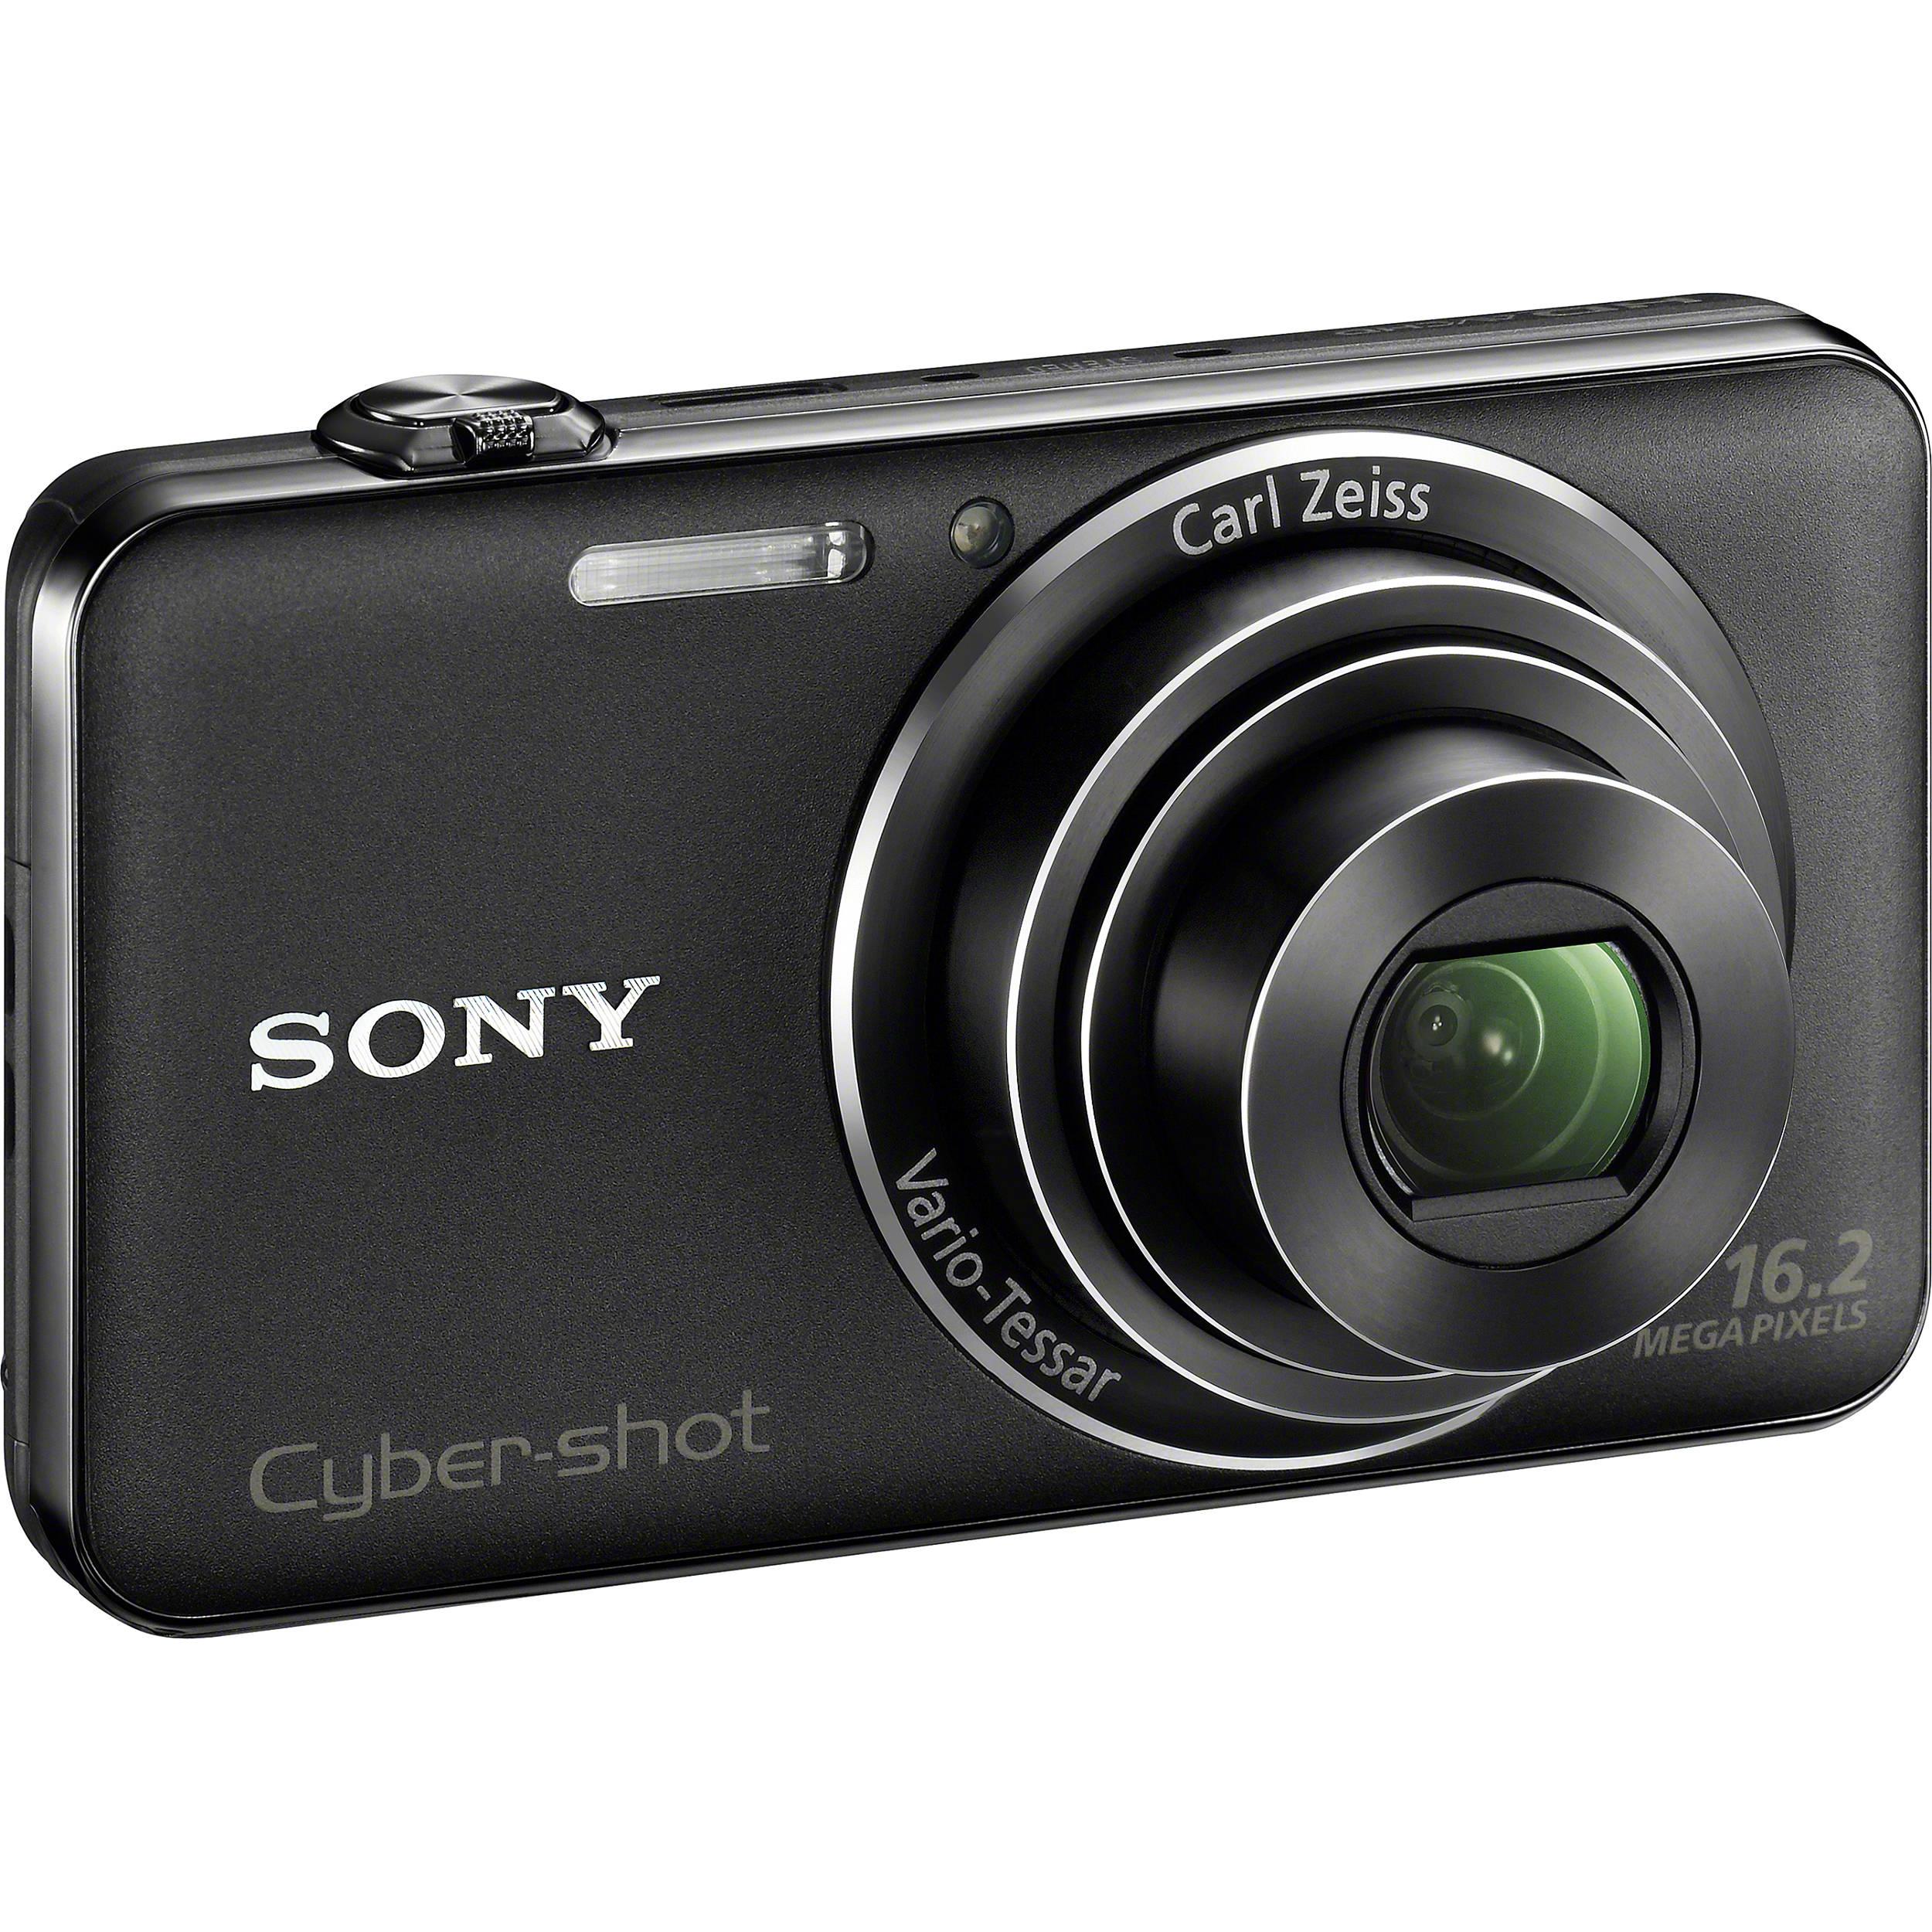 sony cyber shot dsc wx50 digital camera black dscwx50 b b h rh bhphotovideo com sony cyber shot dsc wx50 manual portugues sony cyber shot dsc-w50 manual